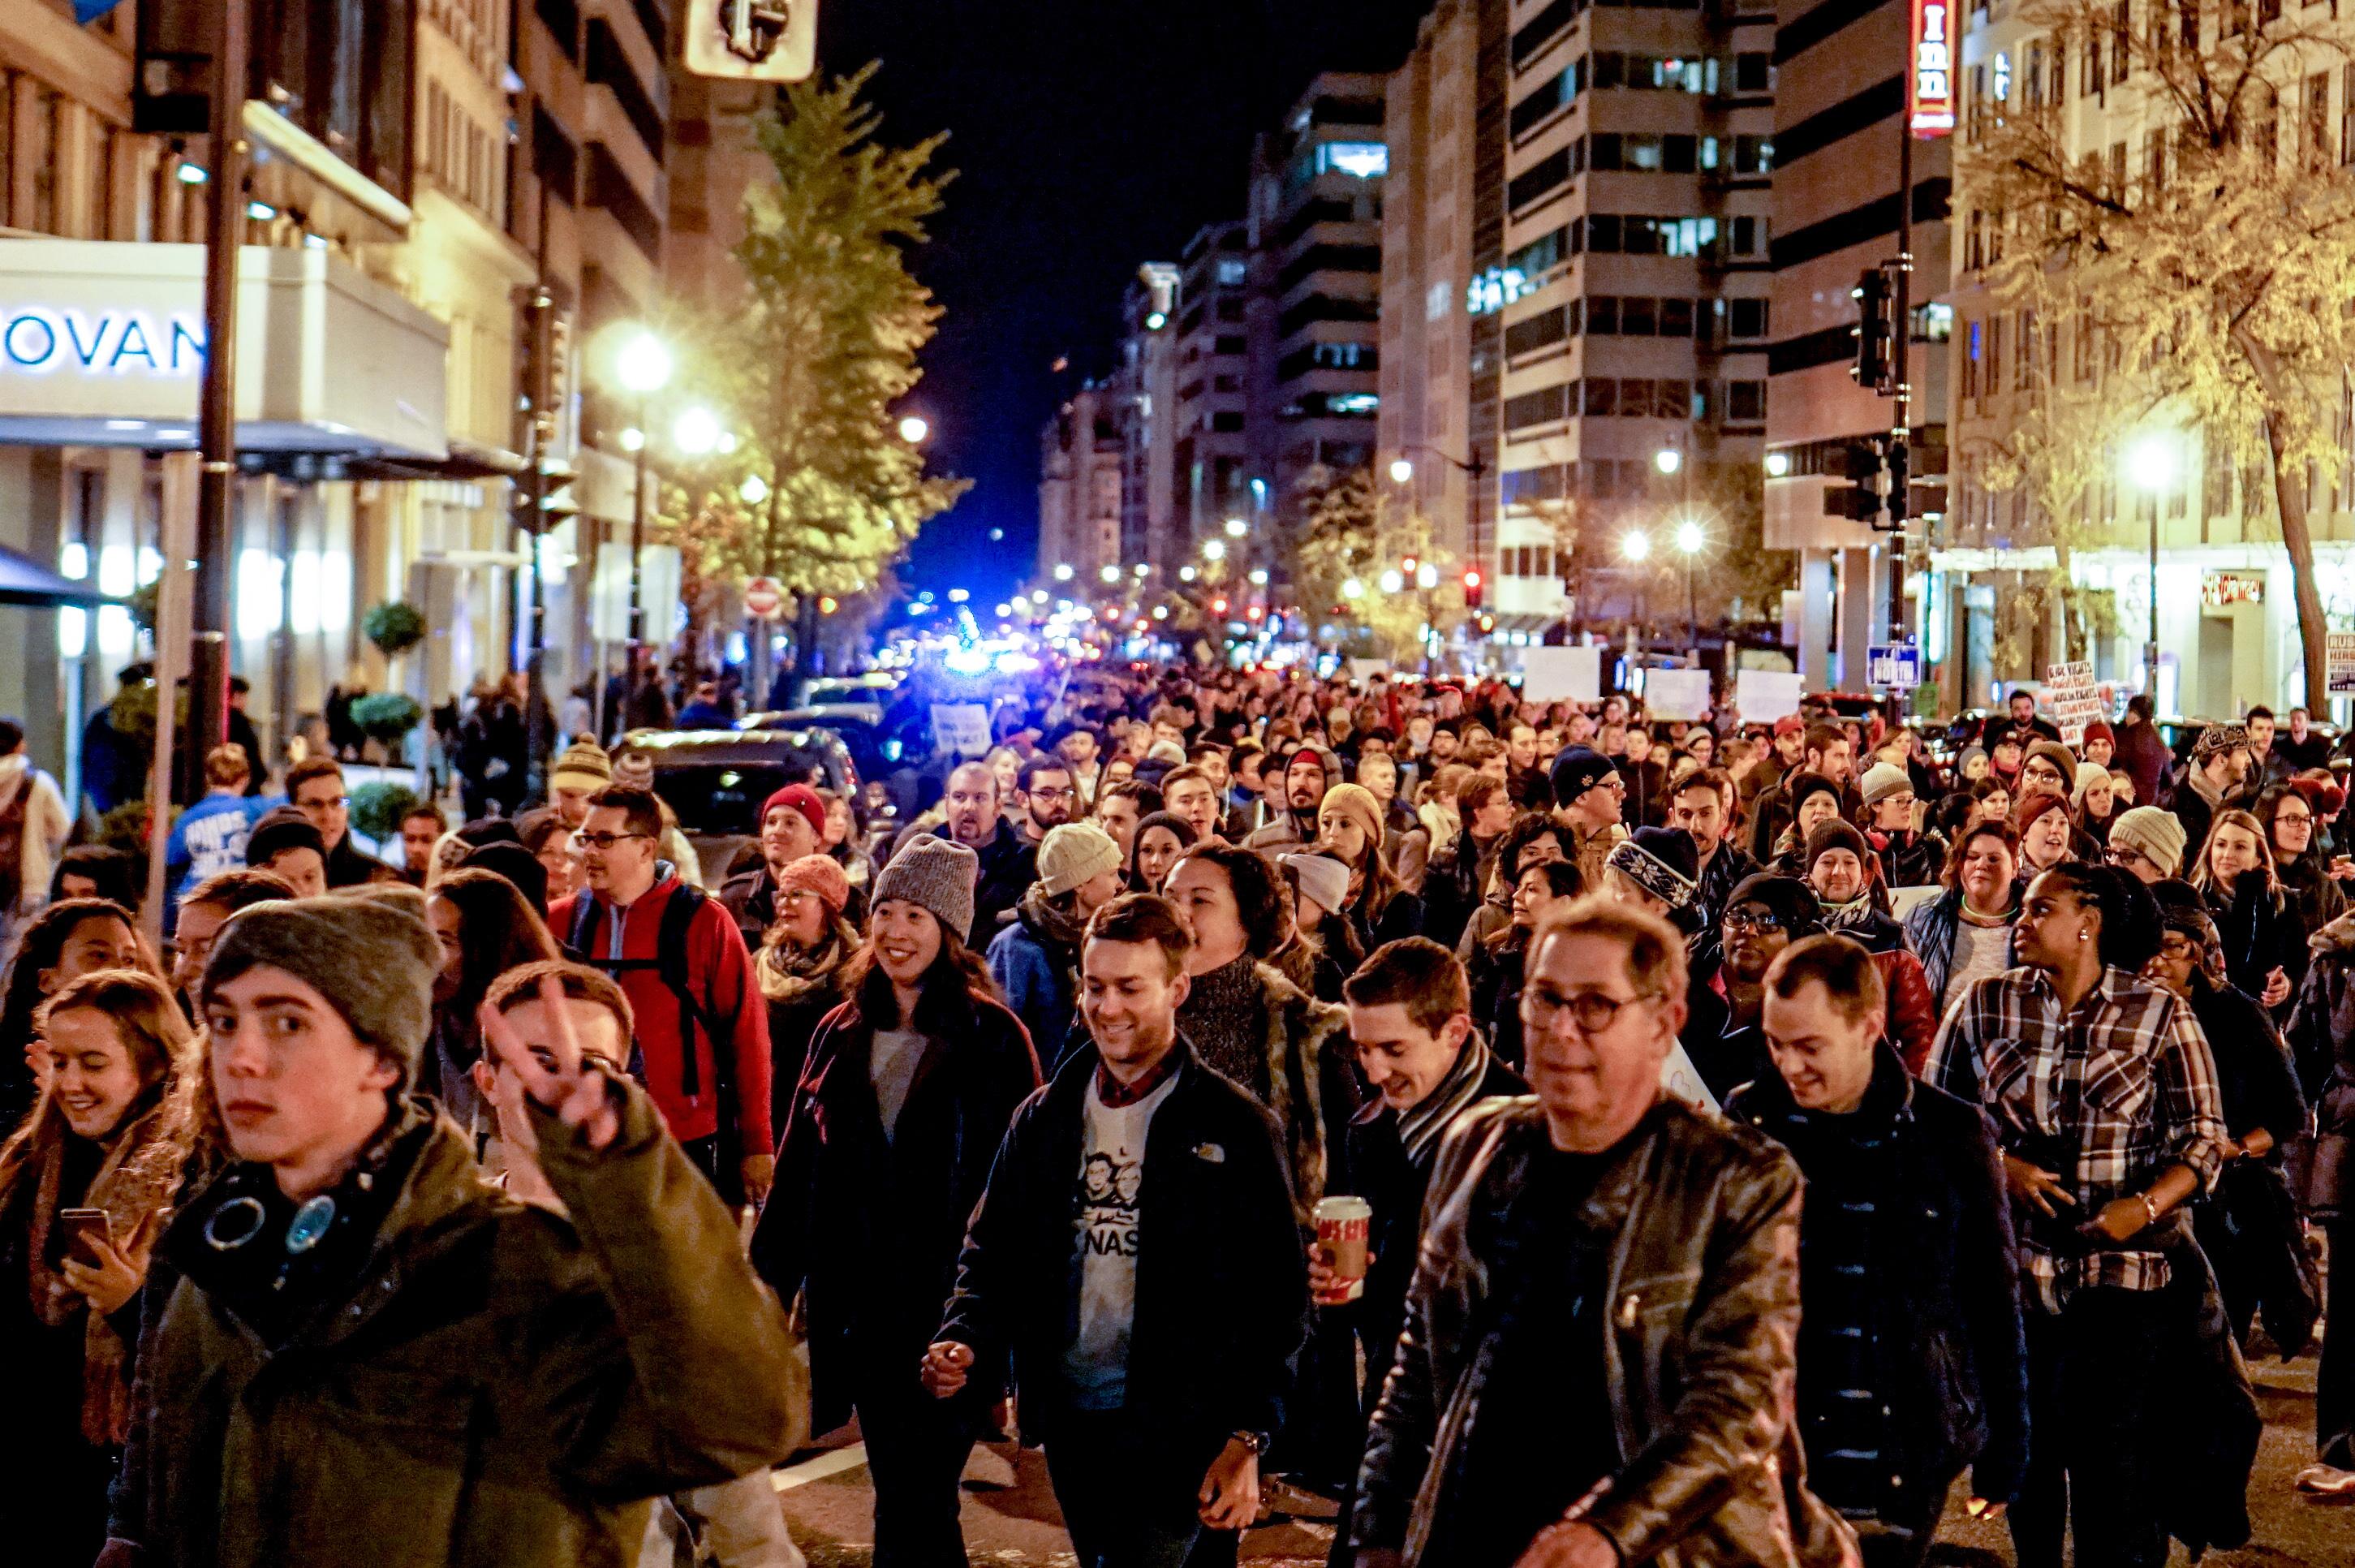 https://upload.wikimedia.org/wikipedia/commons/f/ff/Anti-Trump_Protest_Washington,_DC.jpg